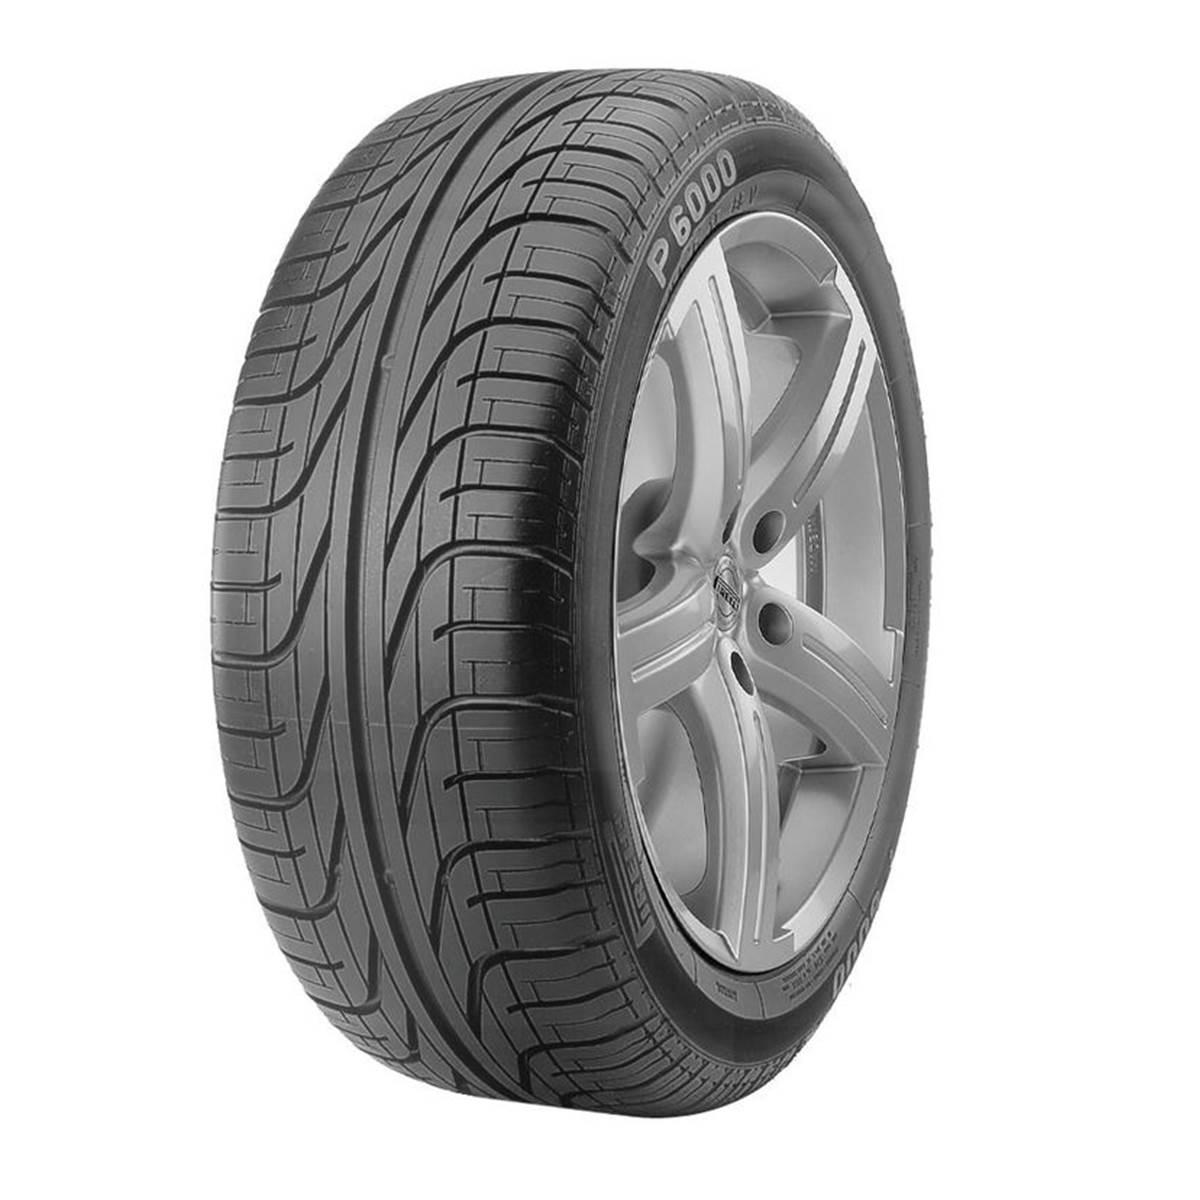 Pneu Pirelli 215/60R15 94W P6000